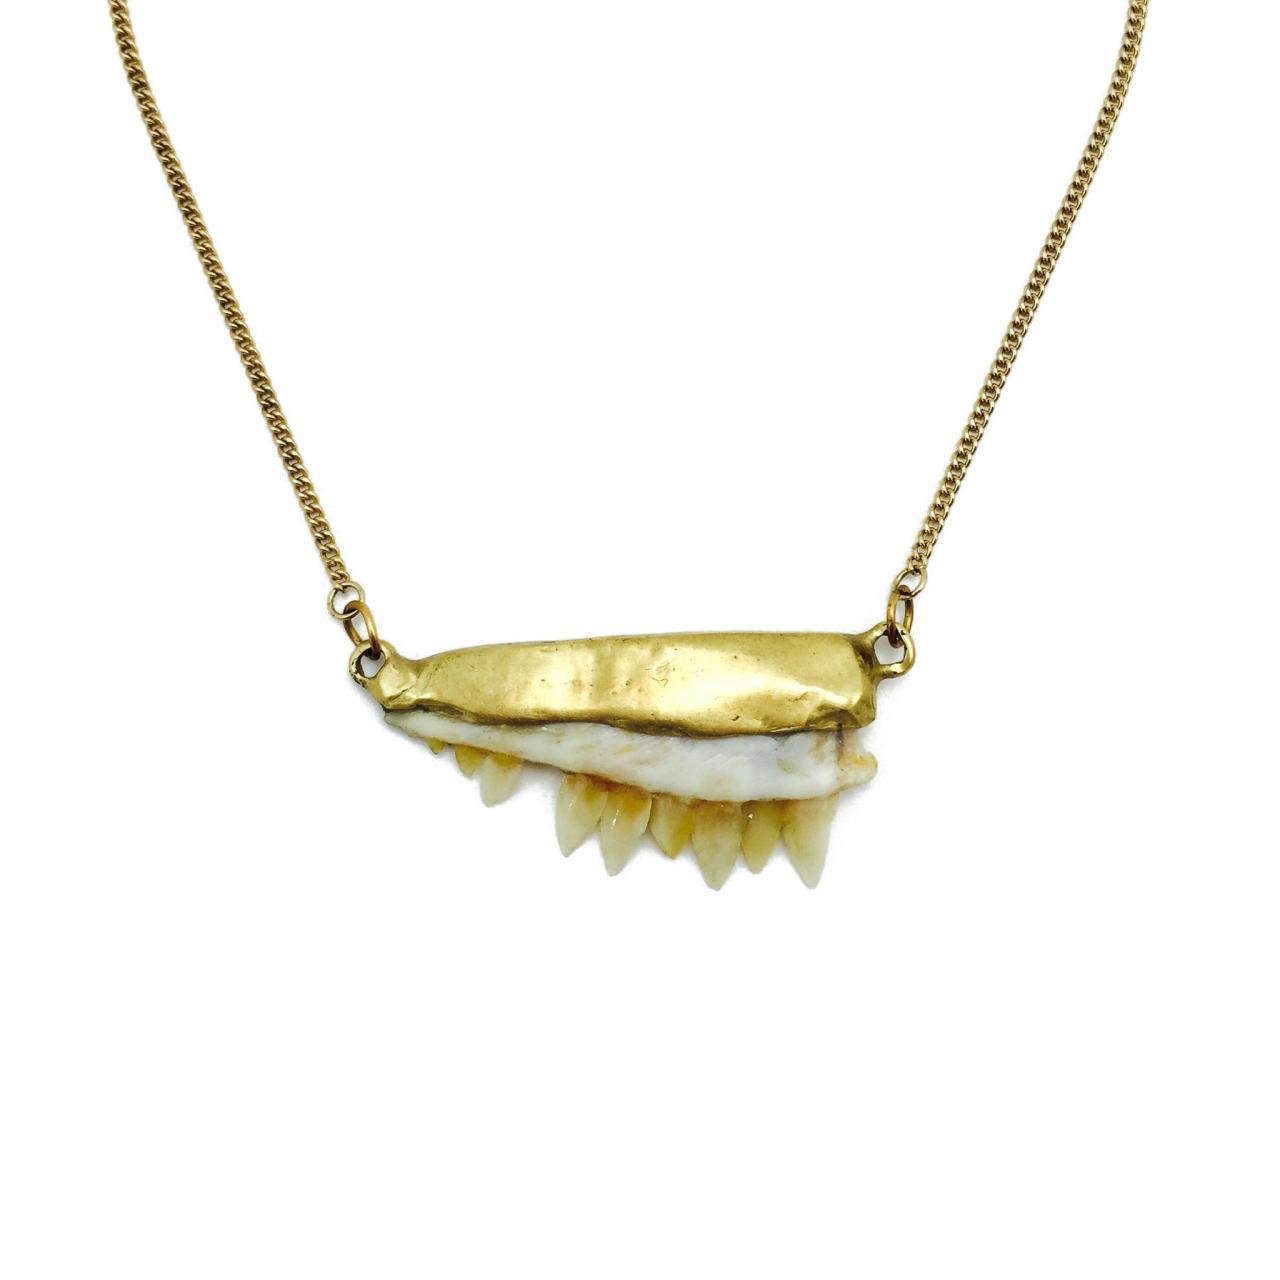 barracuda-jaw-necklace